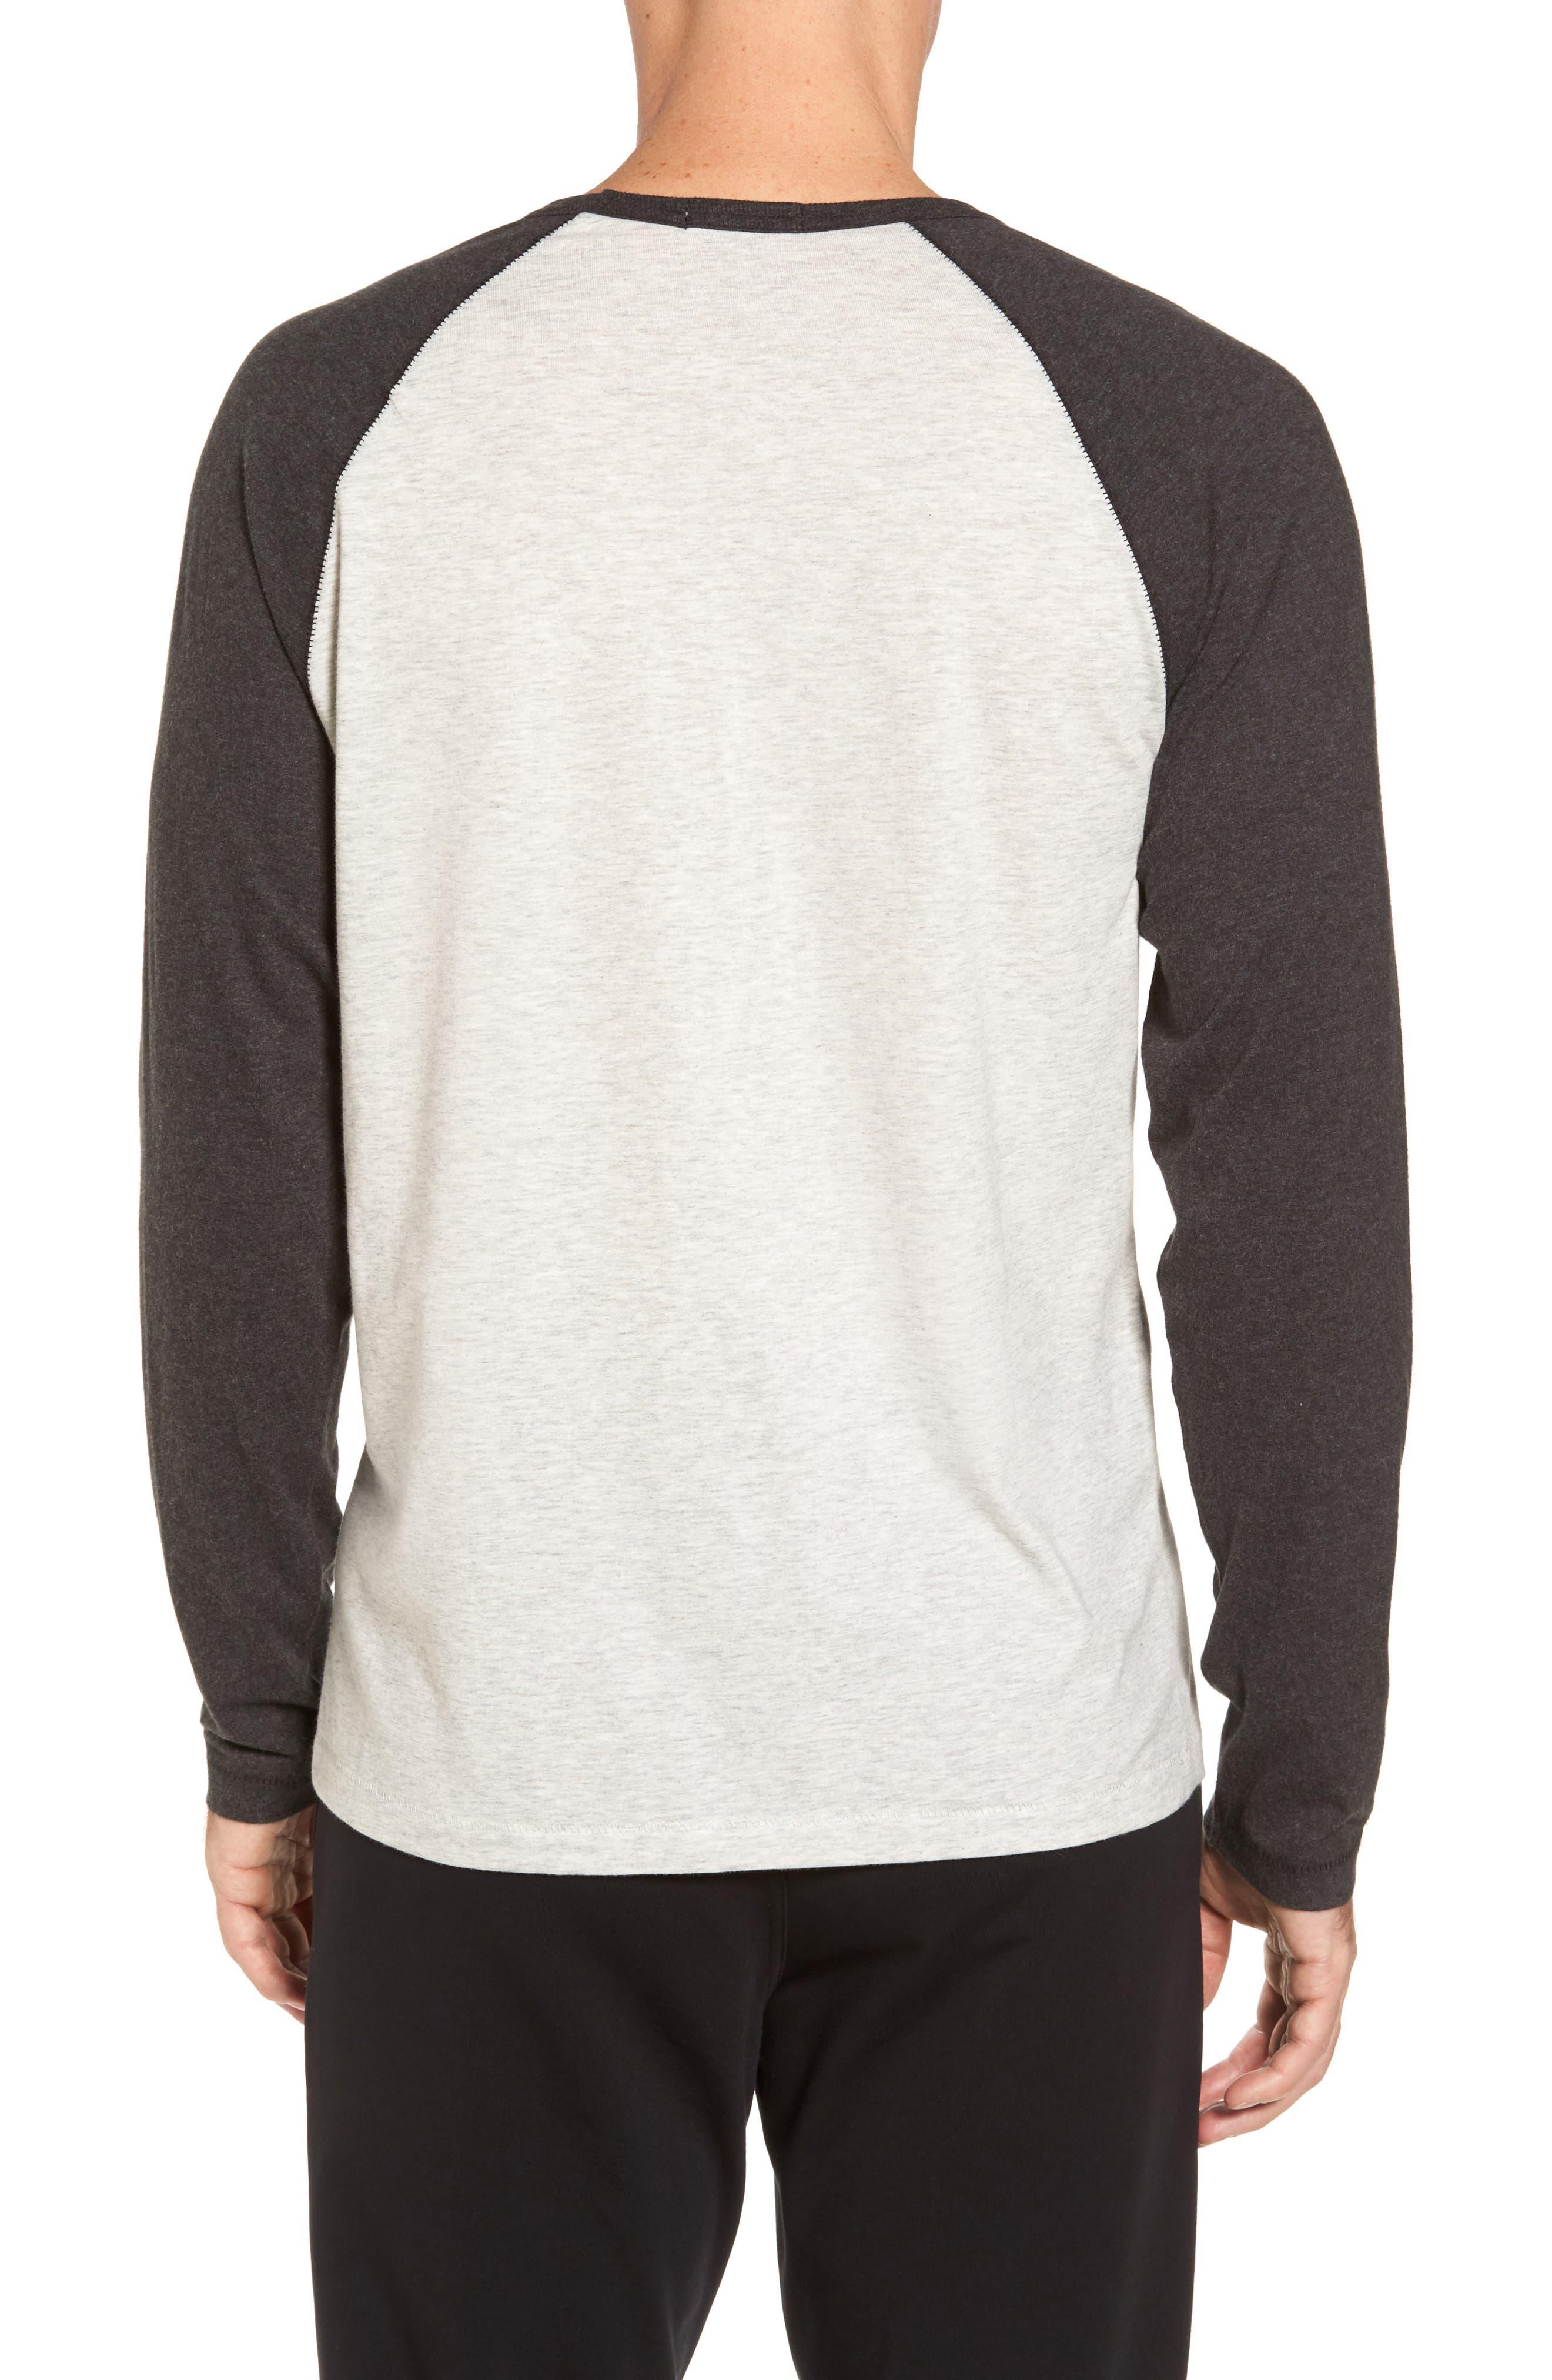 Stefan Raglan T-Shirt,                             Alternate thumbnail 3, color,                             Seal Heather/ Black Bear